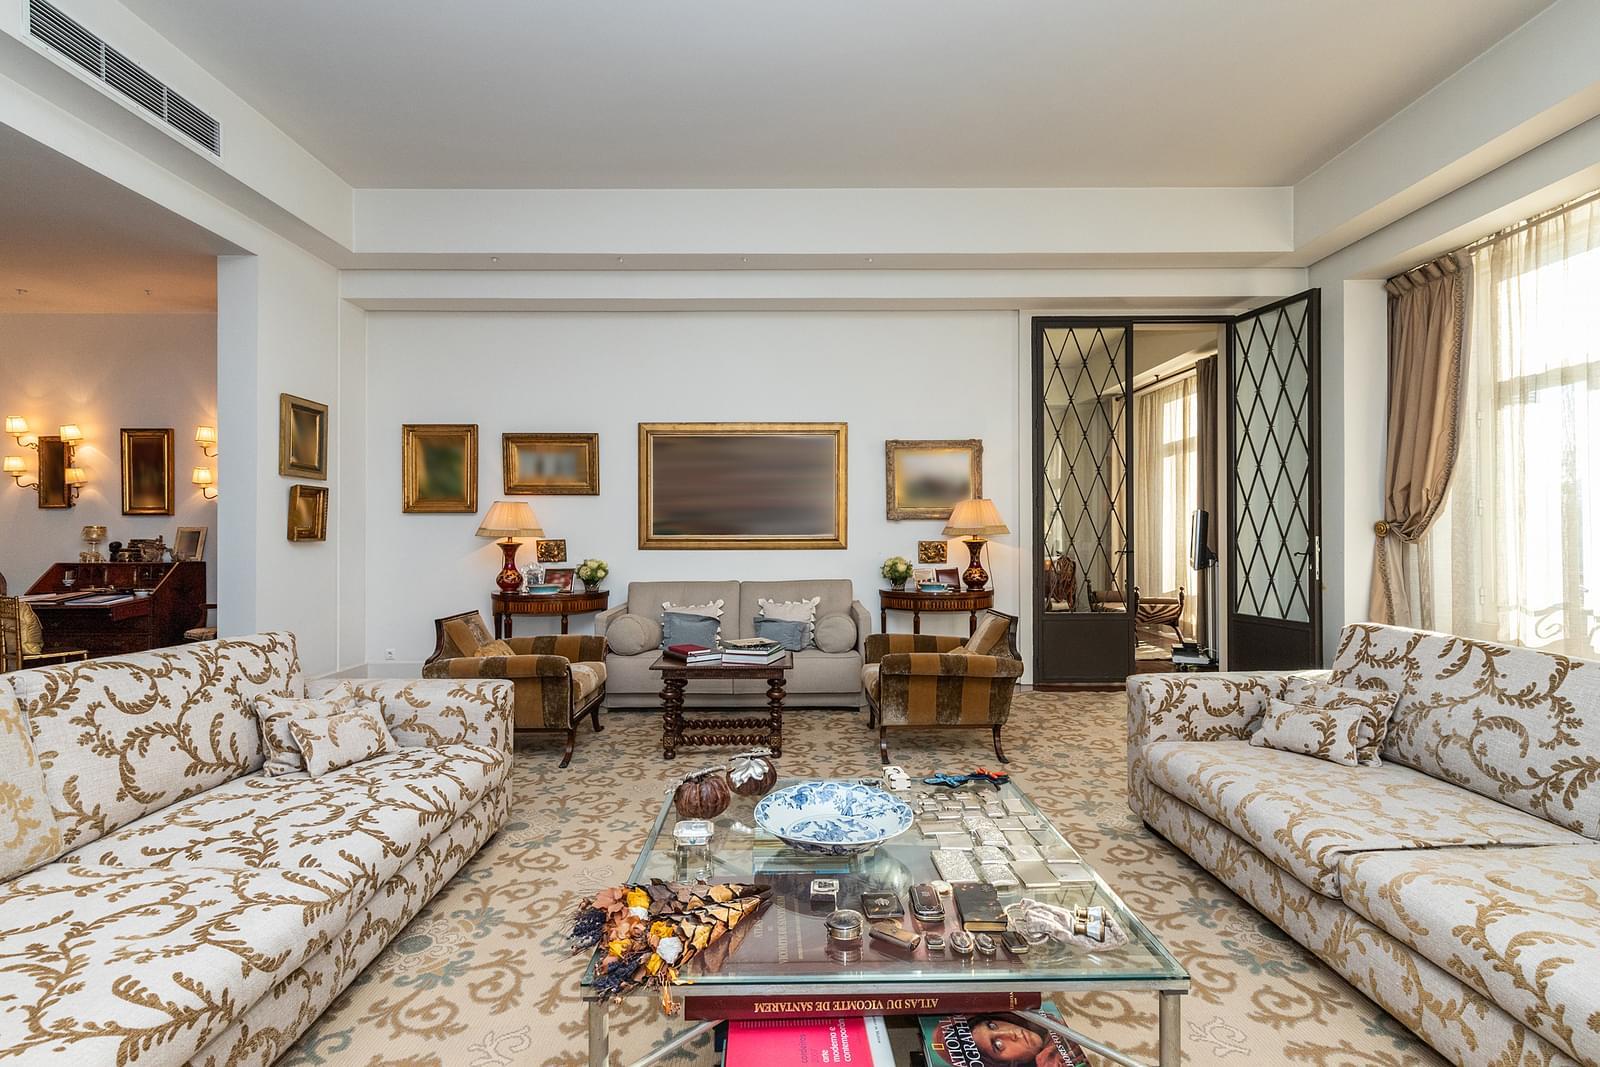 pf18843-apartamento-t3-2-lisboa-0656f985-f389-4c72-aa88-3b1bc1122efc